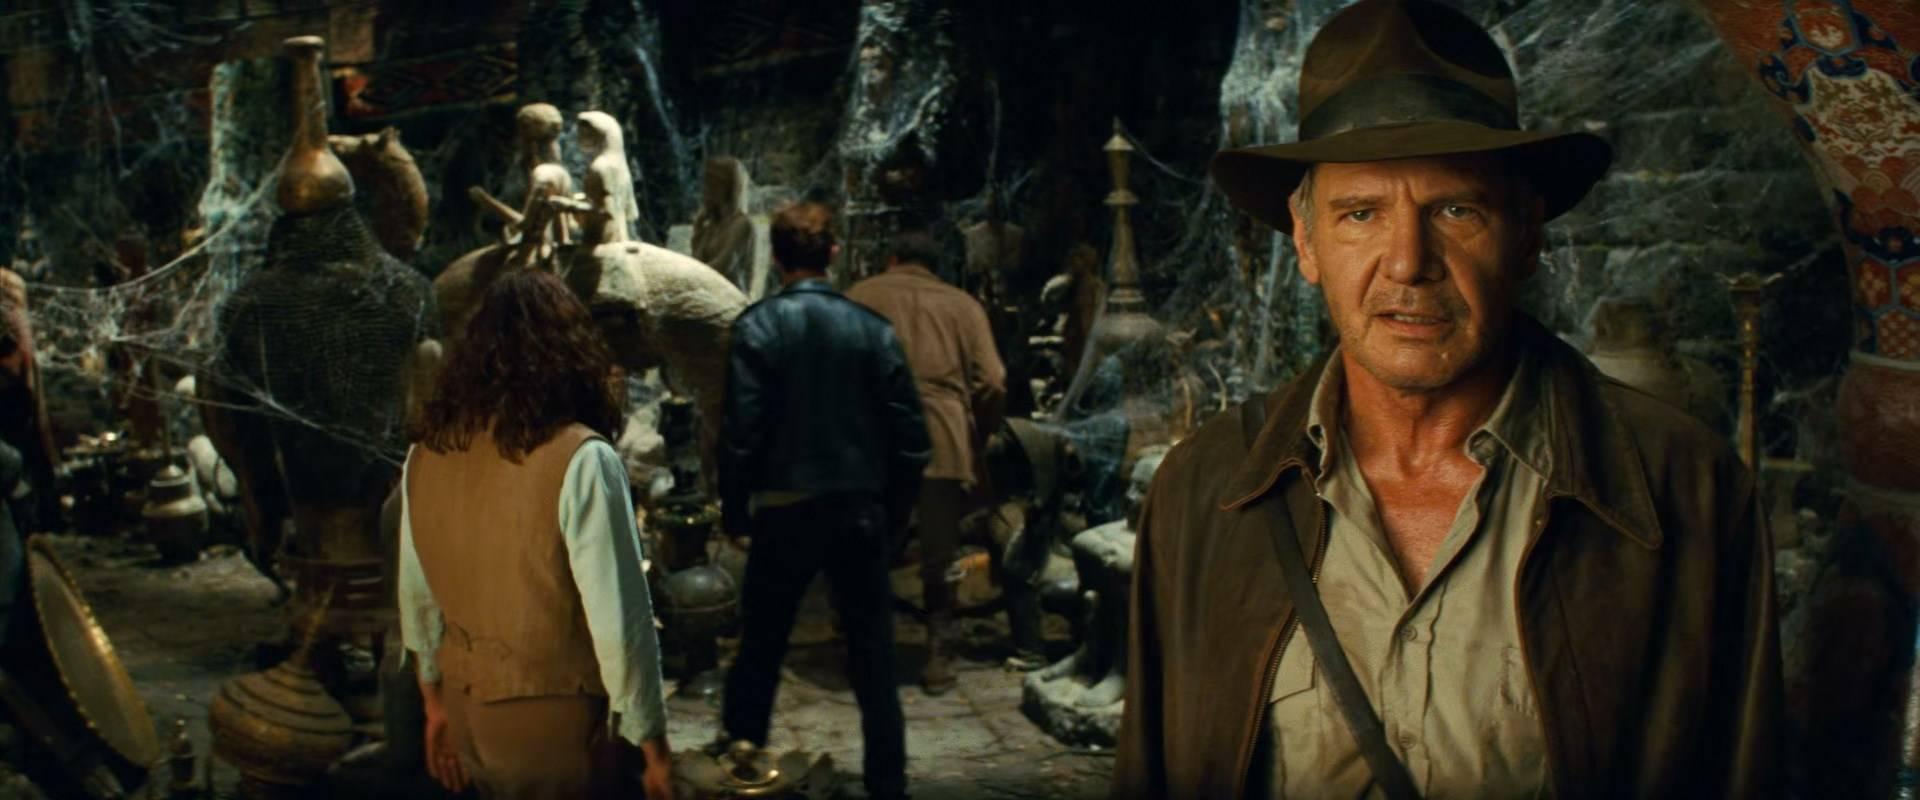 Indiana Jones And The Kingdom Of The Crystal Skull 2008 Avaxhome